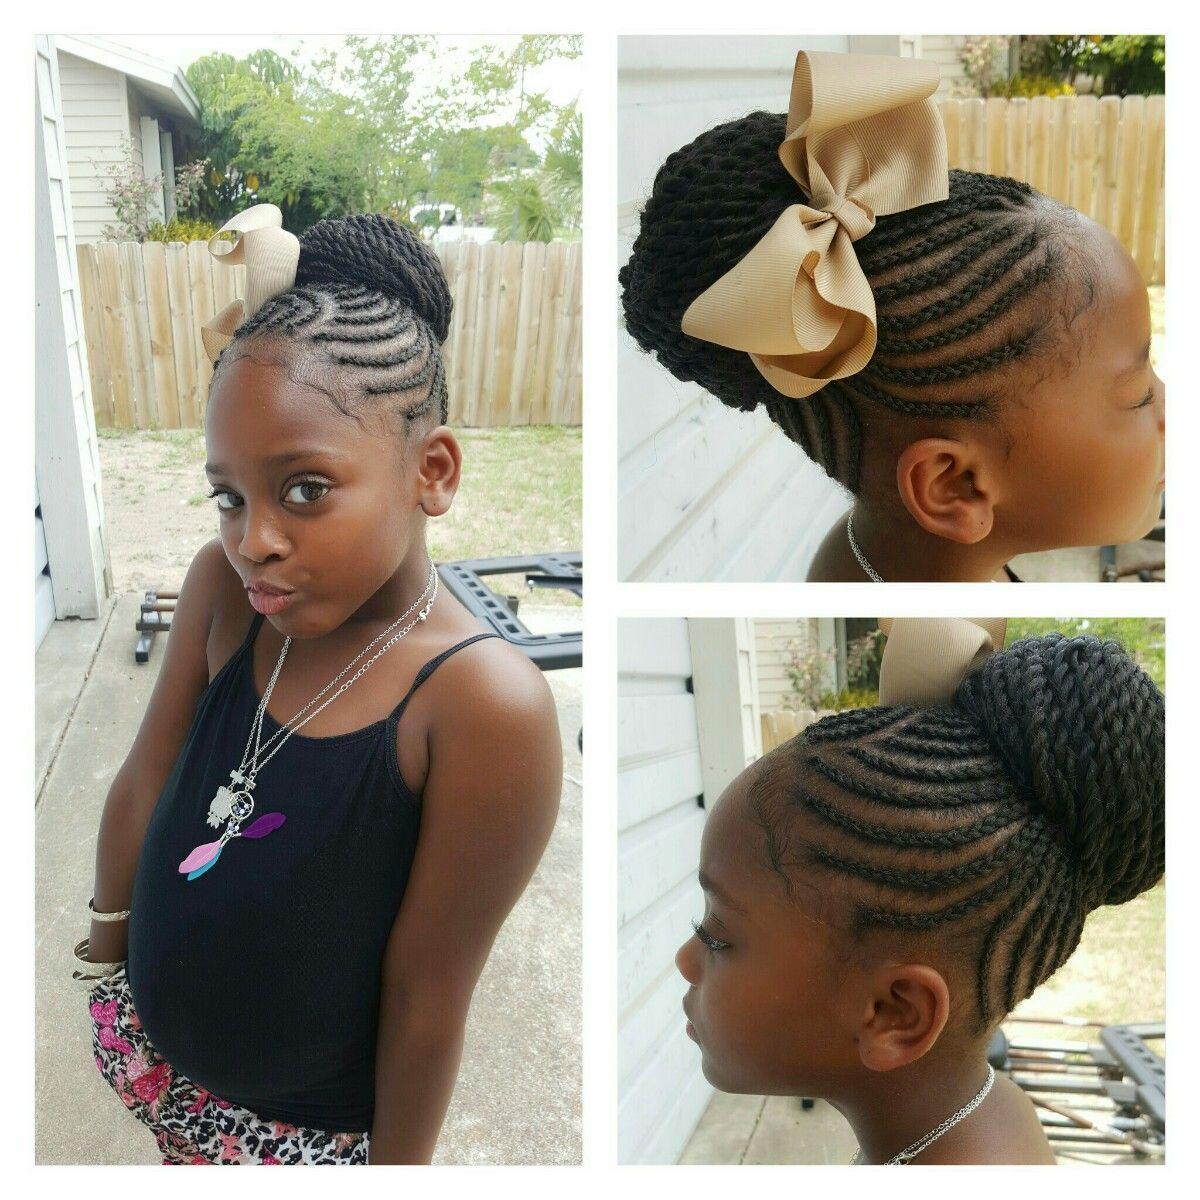 Kids Crotchet Braided Bun Kids Hairstyles Kid Braid Styles Braids For Kids